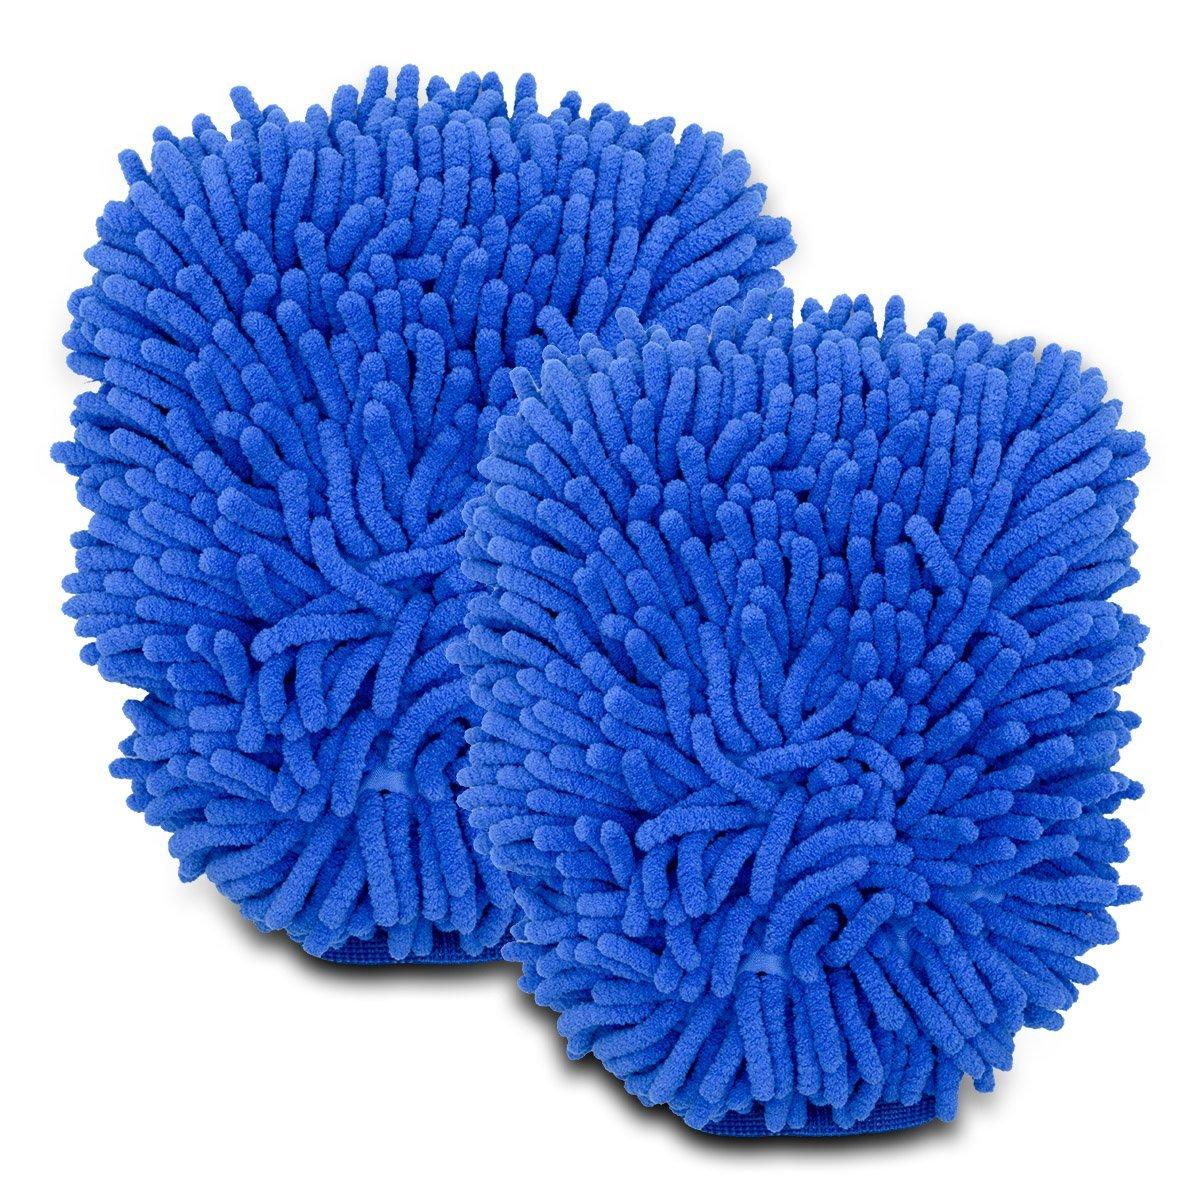 Car Wash Handschuh, Maso 9.5'x6.7' Premium Chenille Microfiber Wash Mitt - Wash Glove for Car/SUV/Truck Pack of 2 Maso 9.5x6.7 Premium Chenille Microfiber Wash Mitt - Wash Glove for Car/SUV/Truck Pack of 2